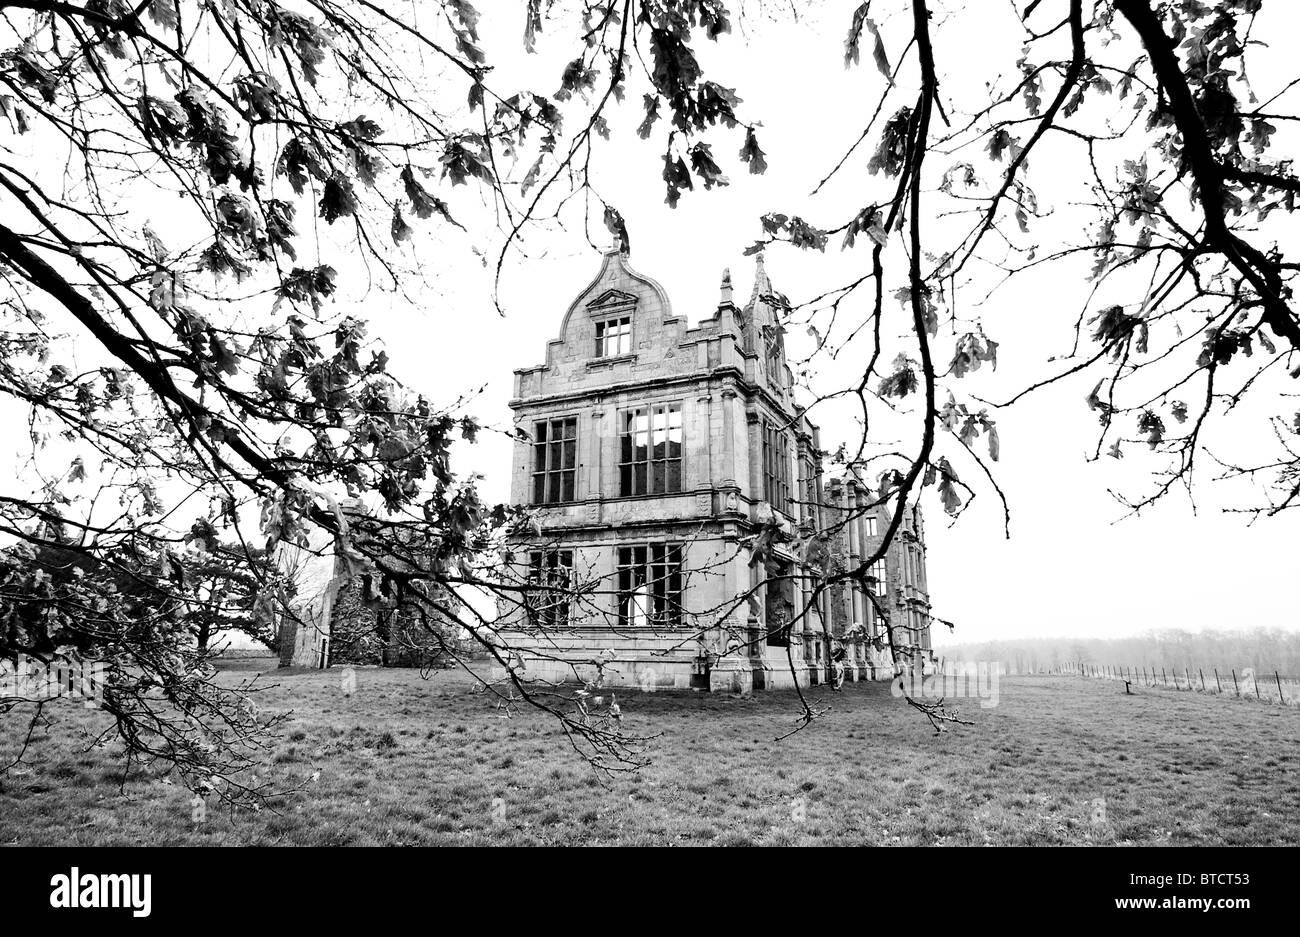 Moreton Corbet castle ruins, Shropshire, UK - Stock Image